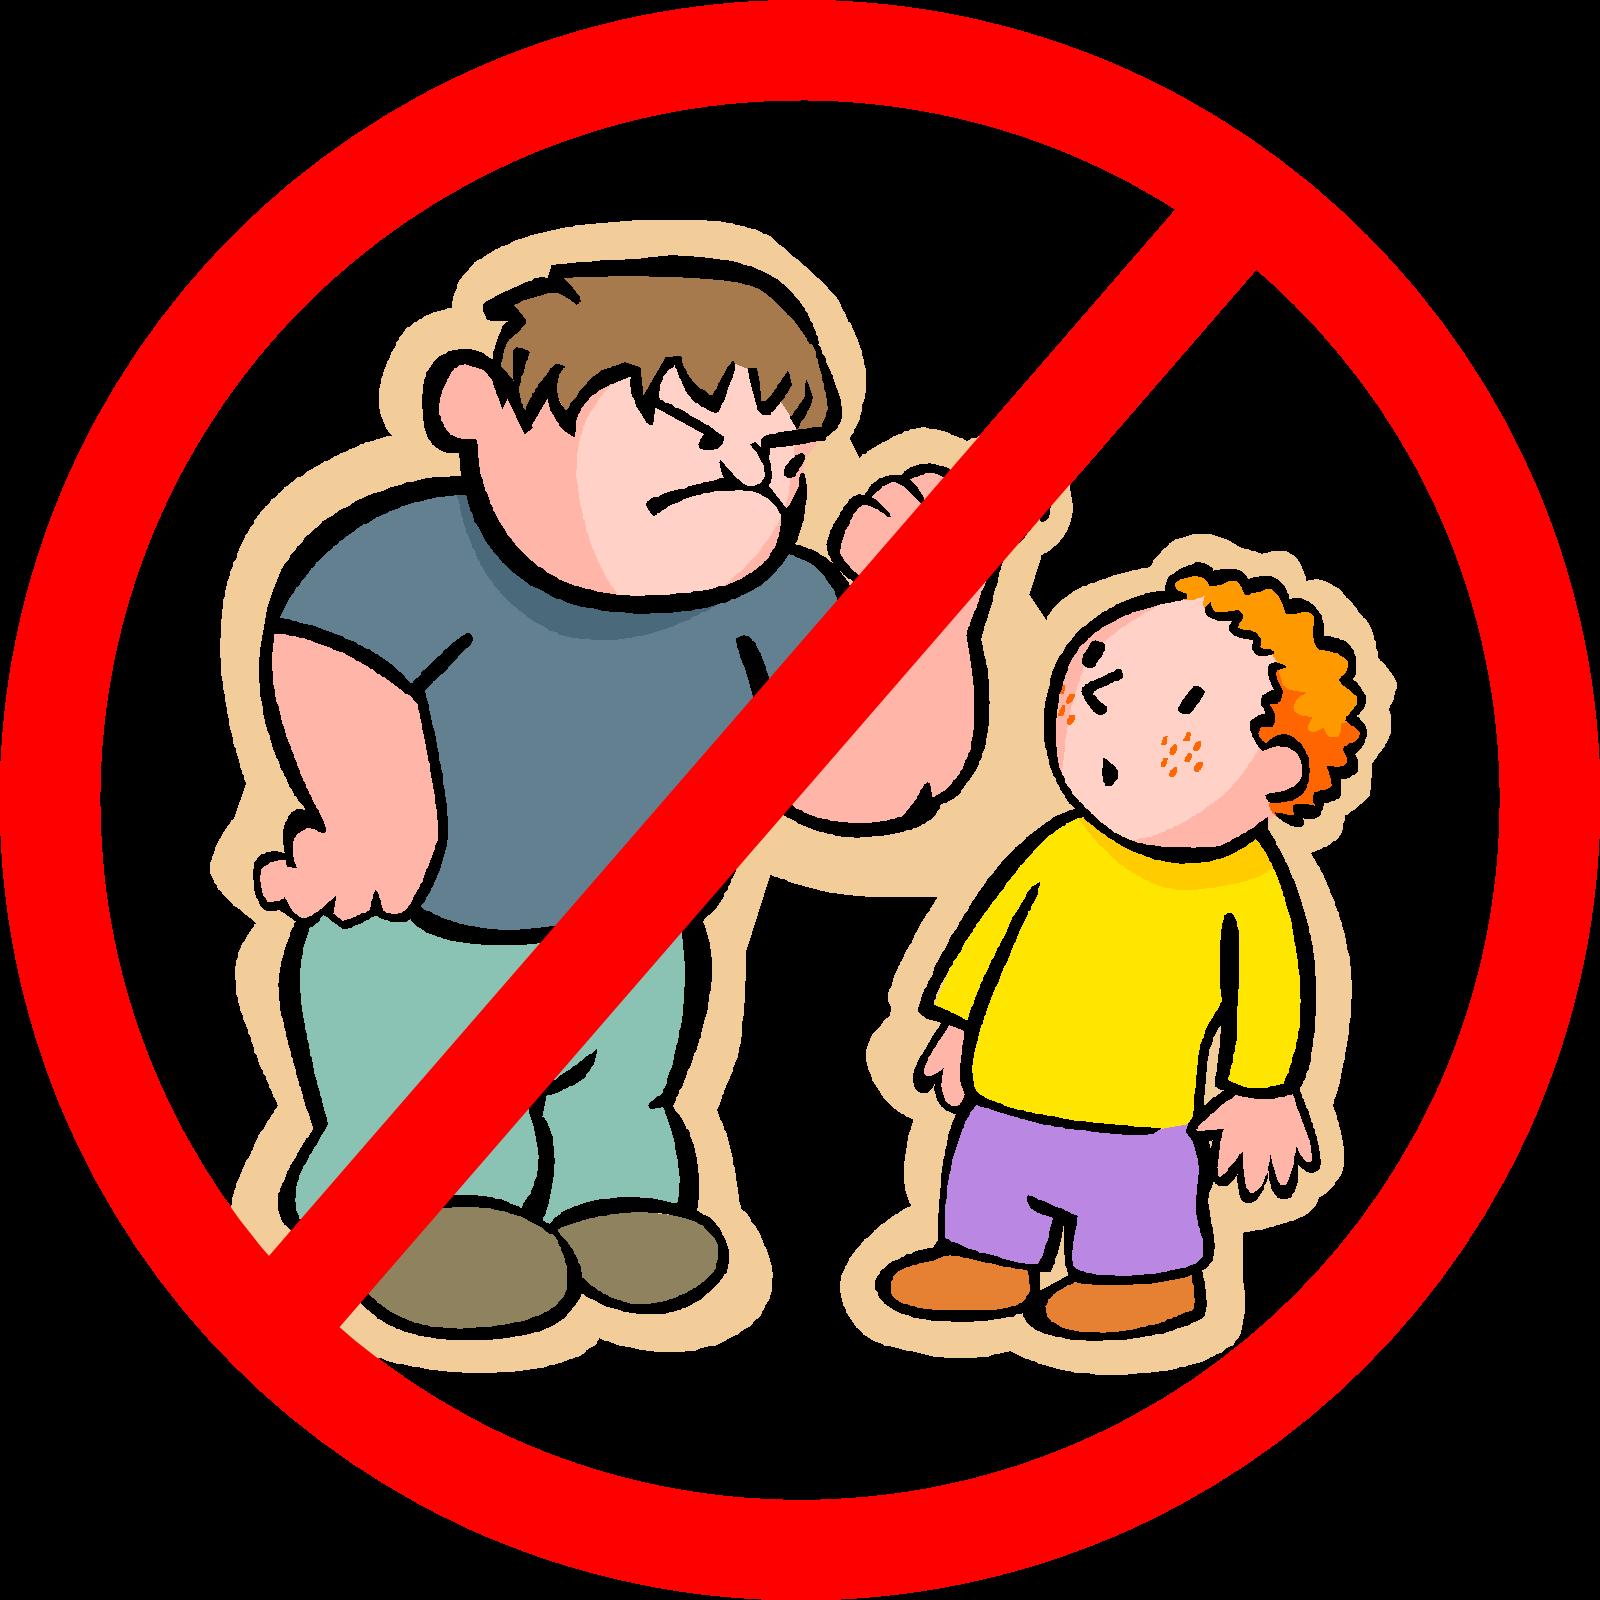 Kindergarten Amp Preschool For Parents Amp Teachers Stop Bullying It Starts At Home